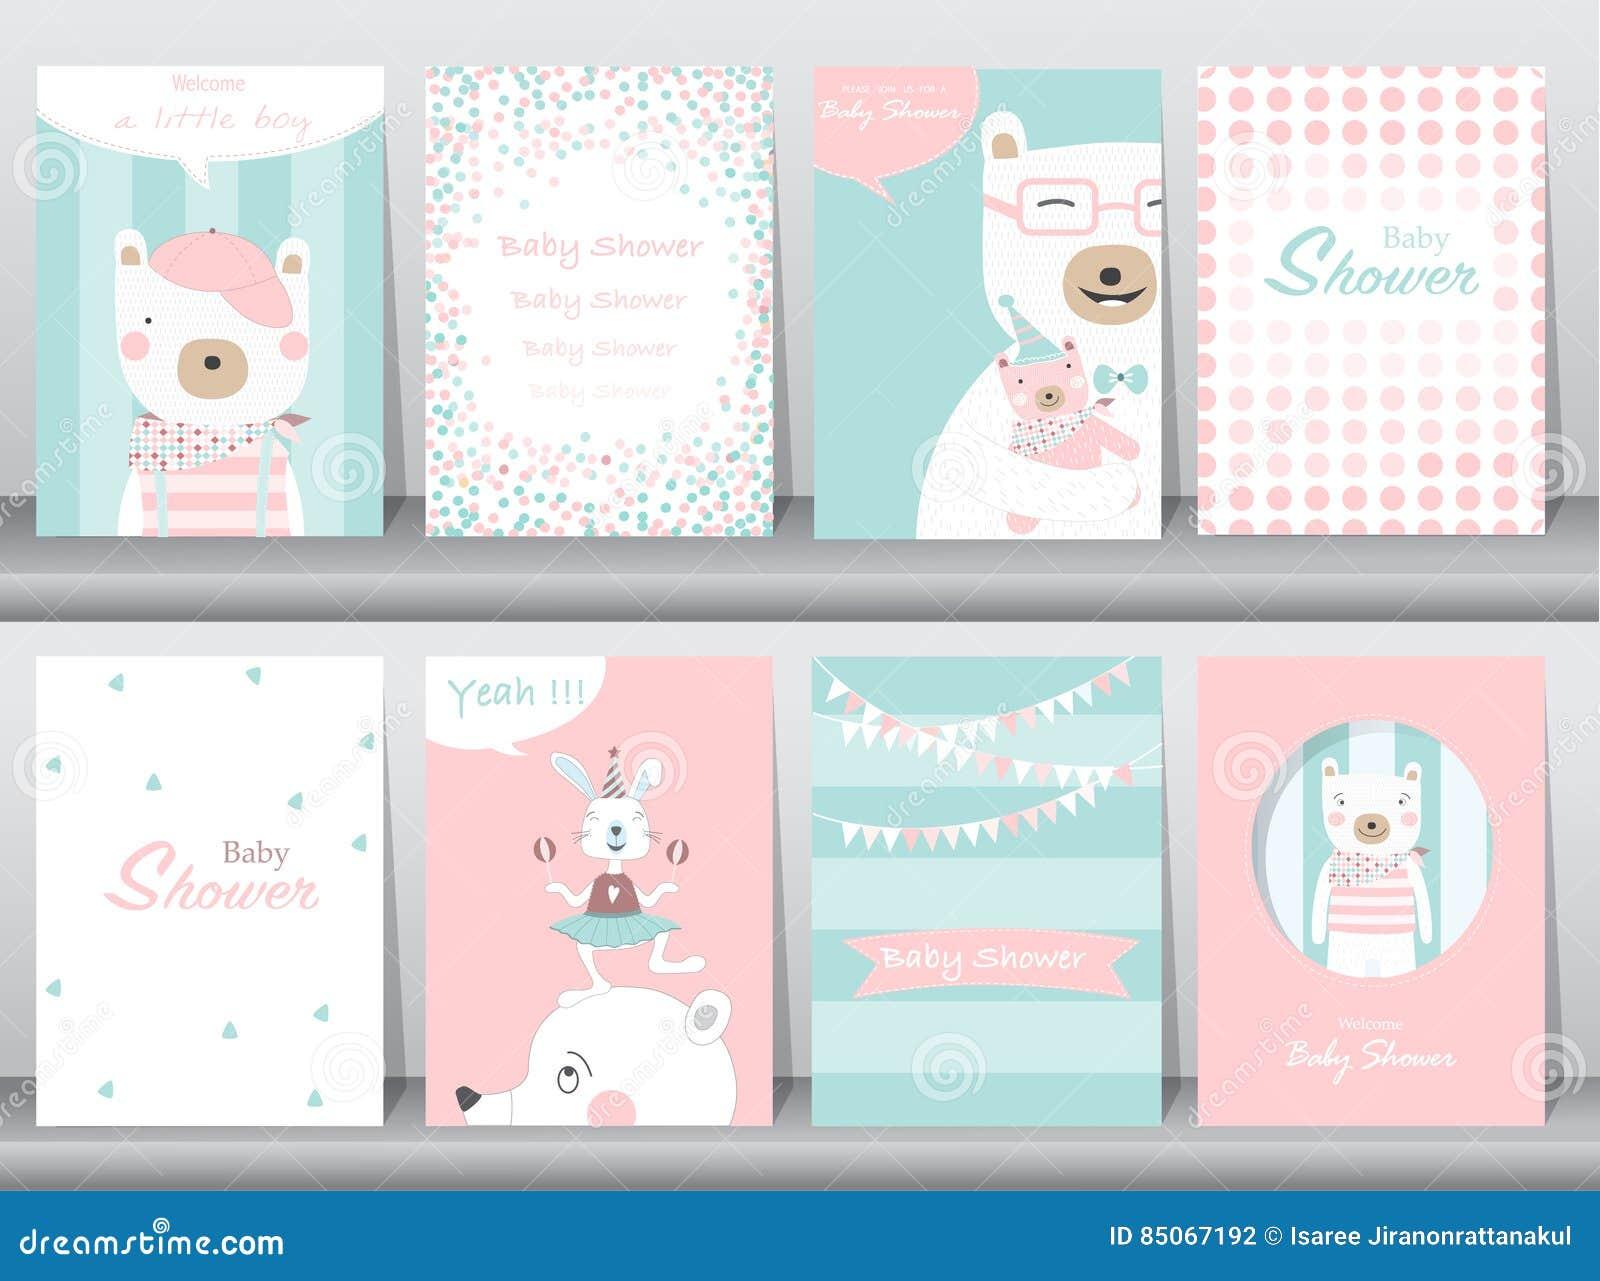 Set of baby shower invitation cardsbirthdaypostertemplate download set of baby shower invitation cardsbirthdaypostertemplategreeting cards maxwellsz